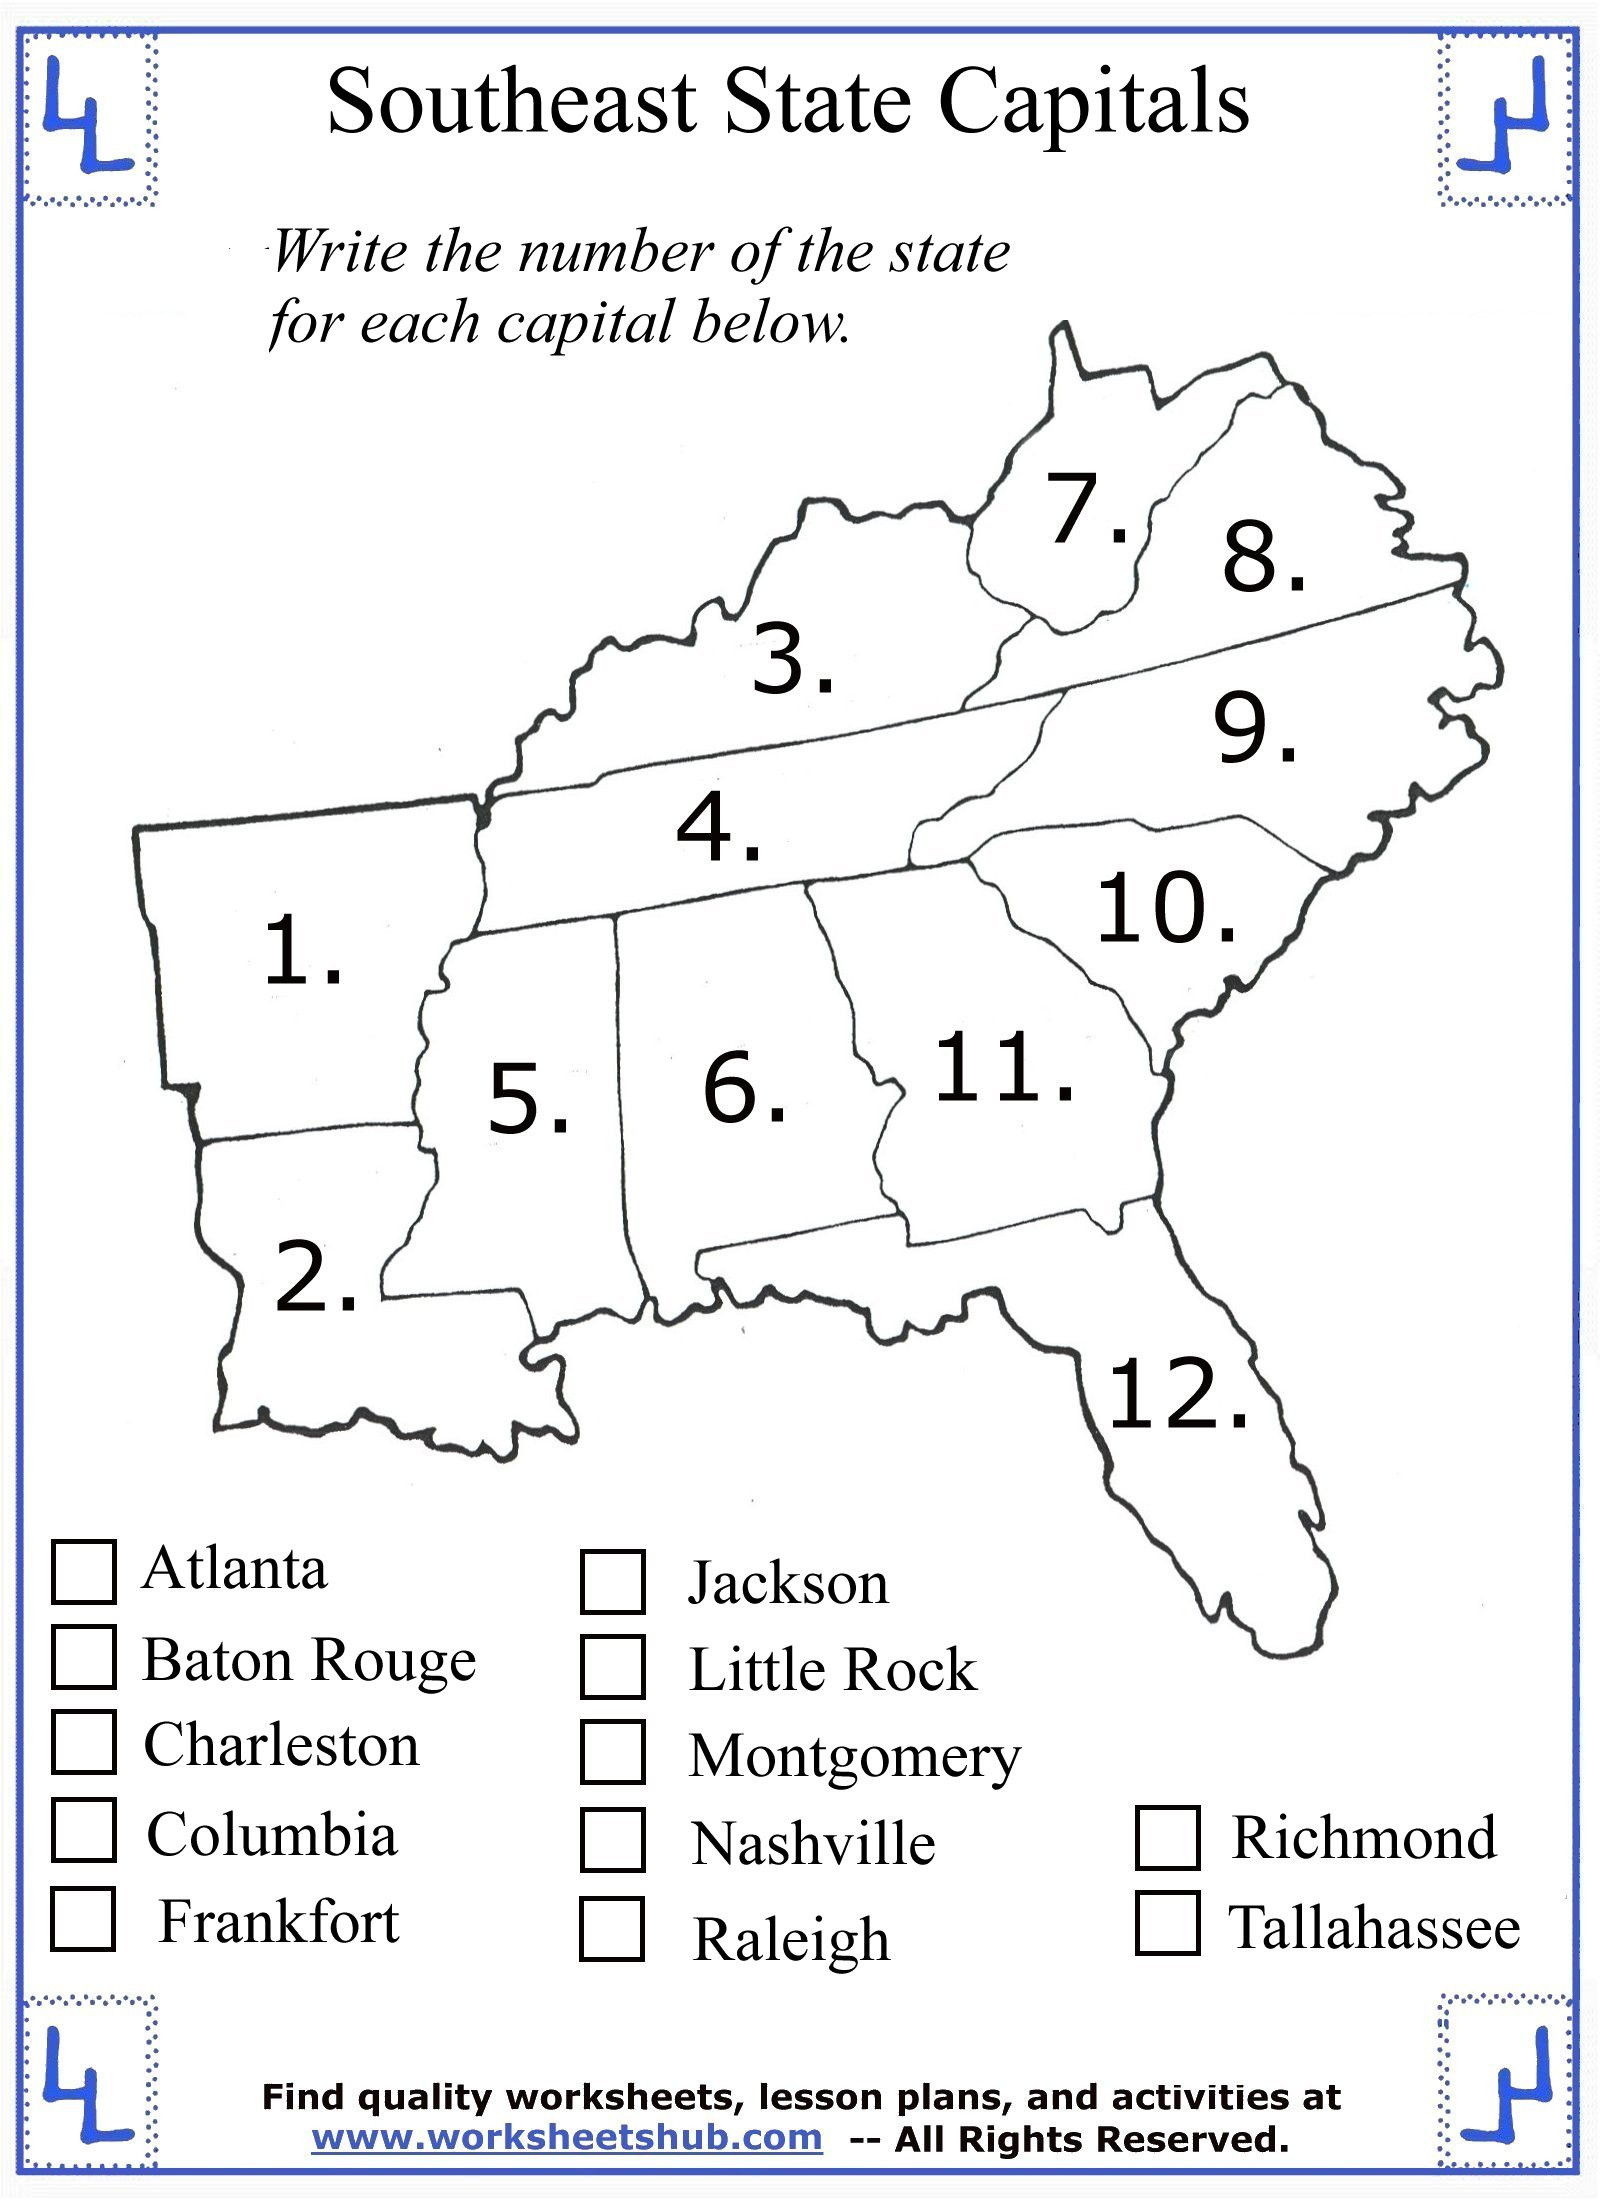 First Grade social Studies Worksheets 4th Grade social Stu S southeast Region States